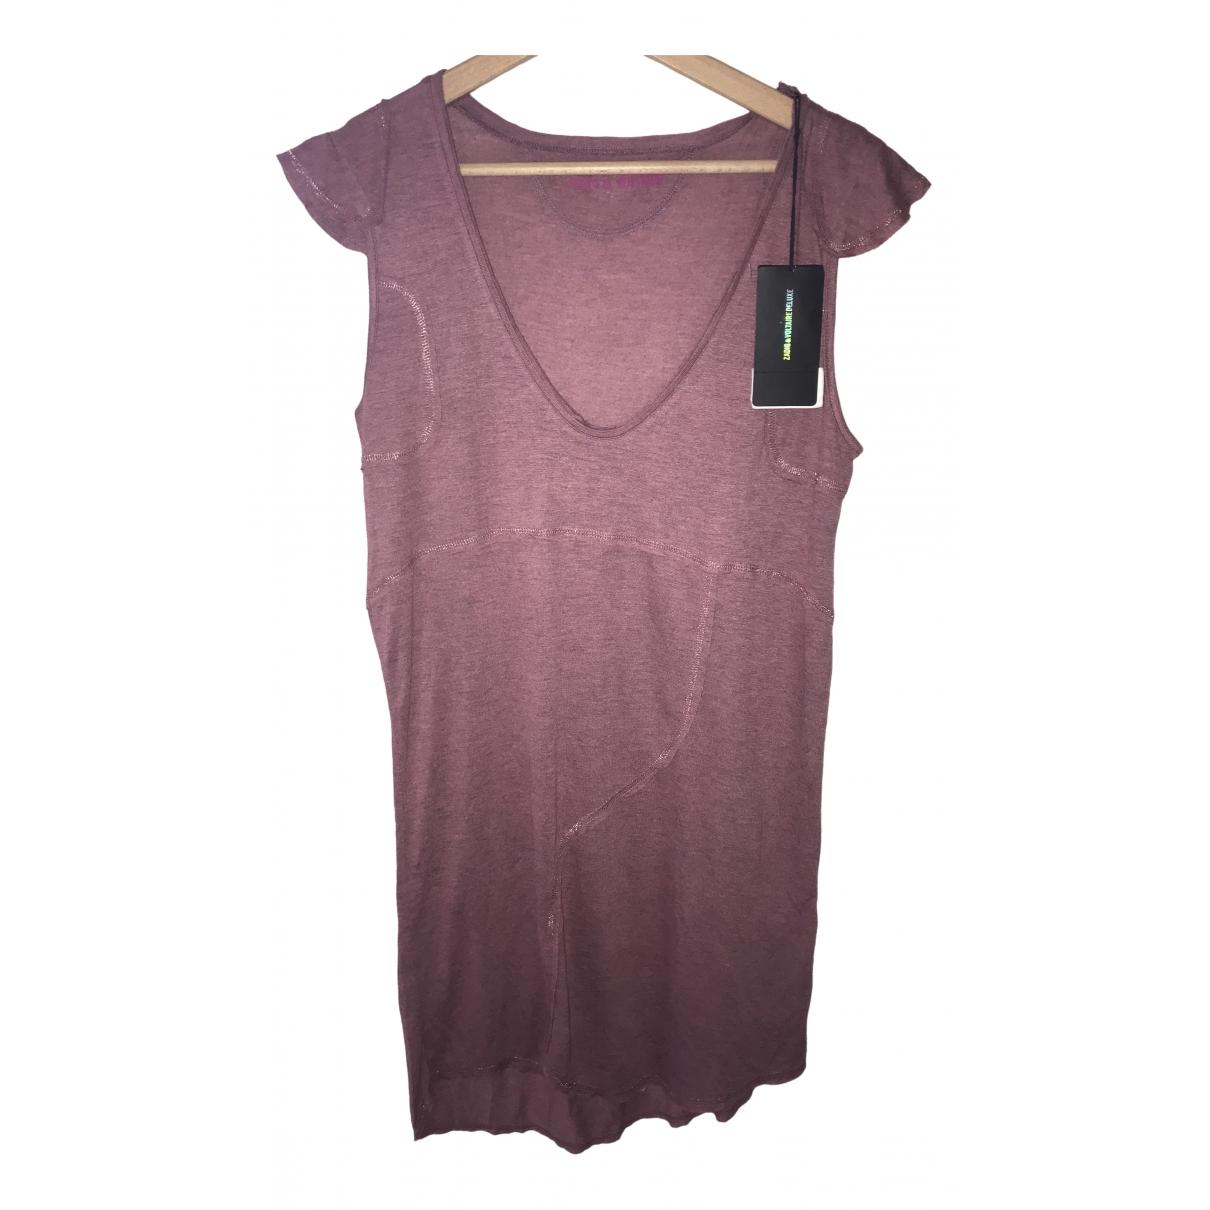 Zadig & Voltaire \N Purple dress for Women M International